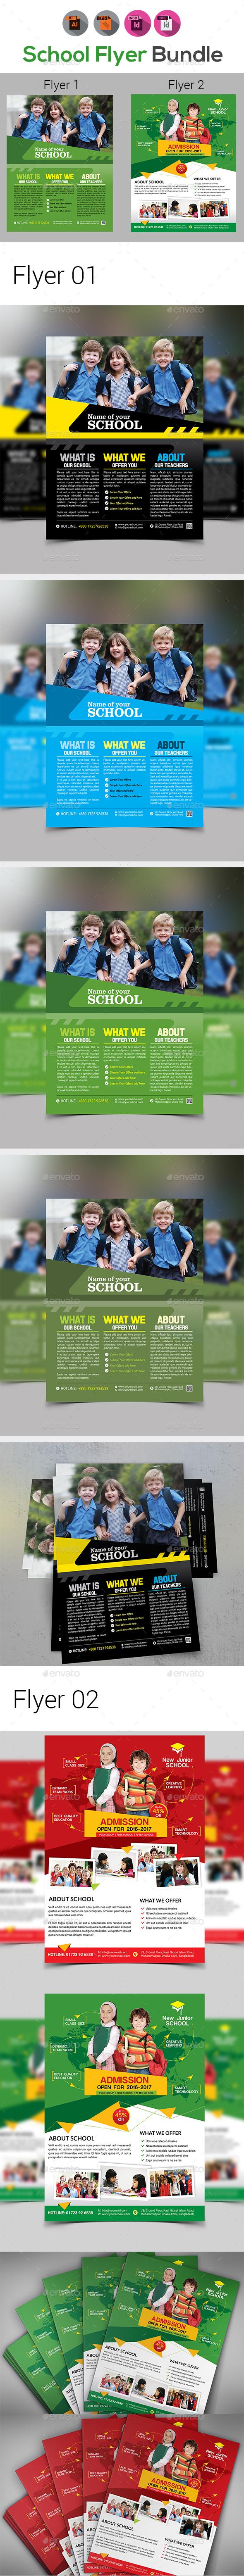 Junior School Promotion Flyers Bundle - Corporate Flyers